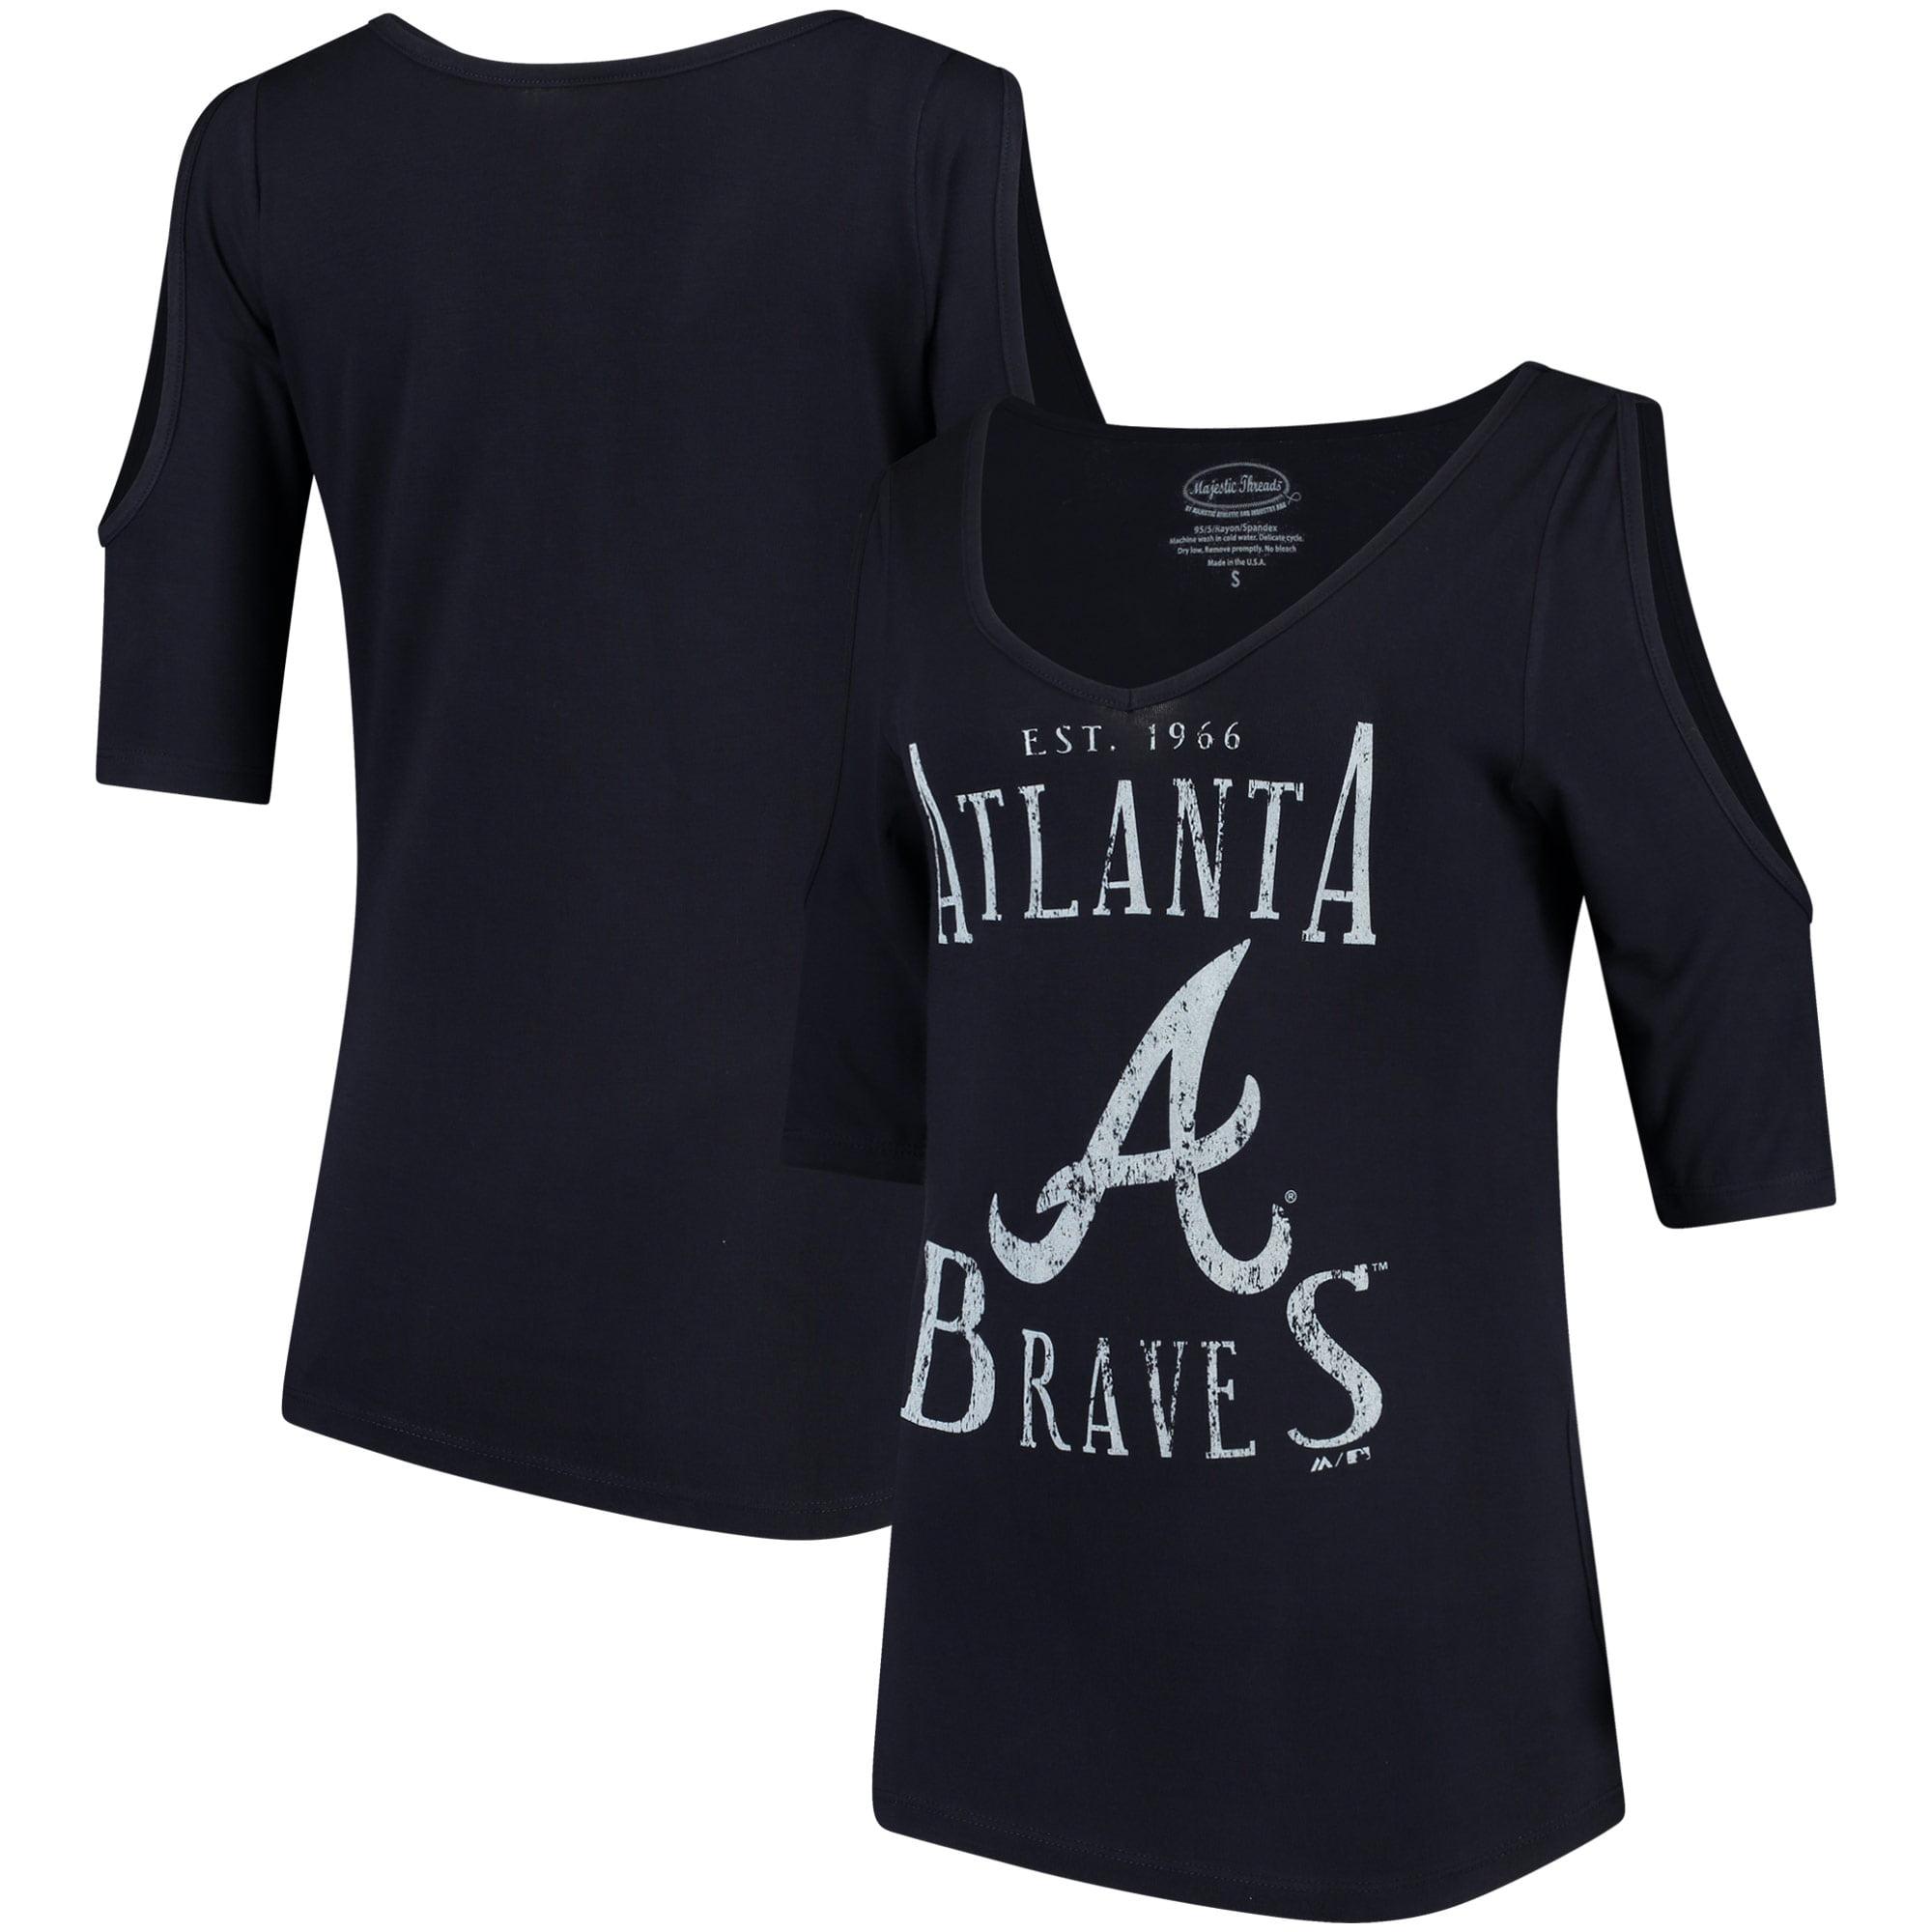 Atlanta Braves Majestic Threads Women's Elbow Sleeve Cold Shoulder V-Neck 3/4-Sleeve Blouse - Navy